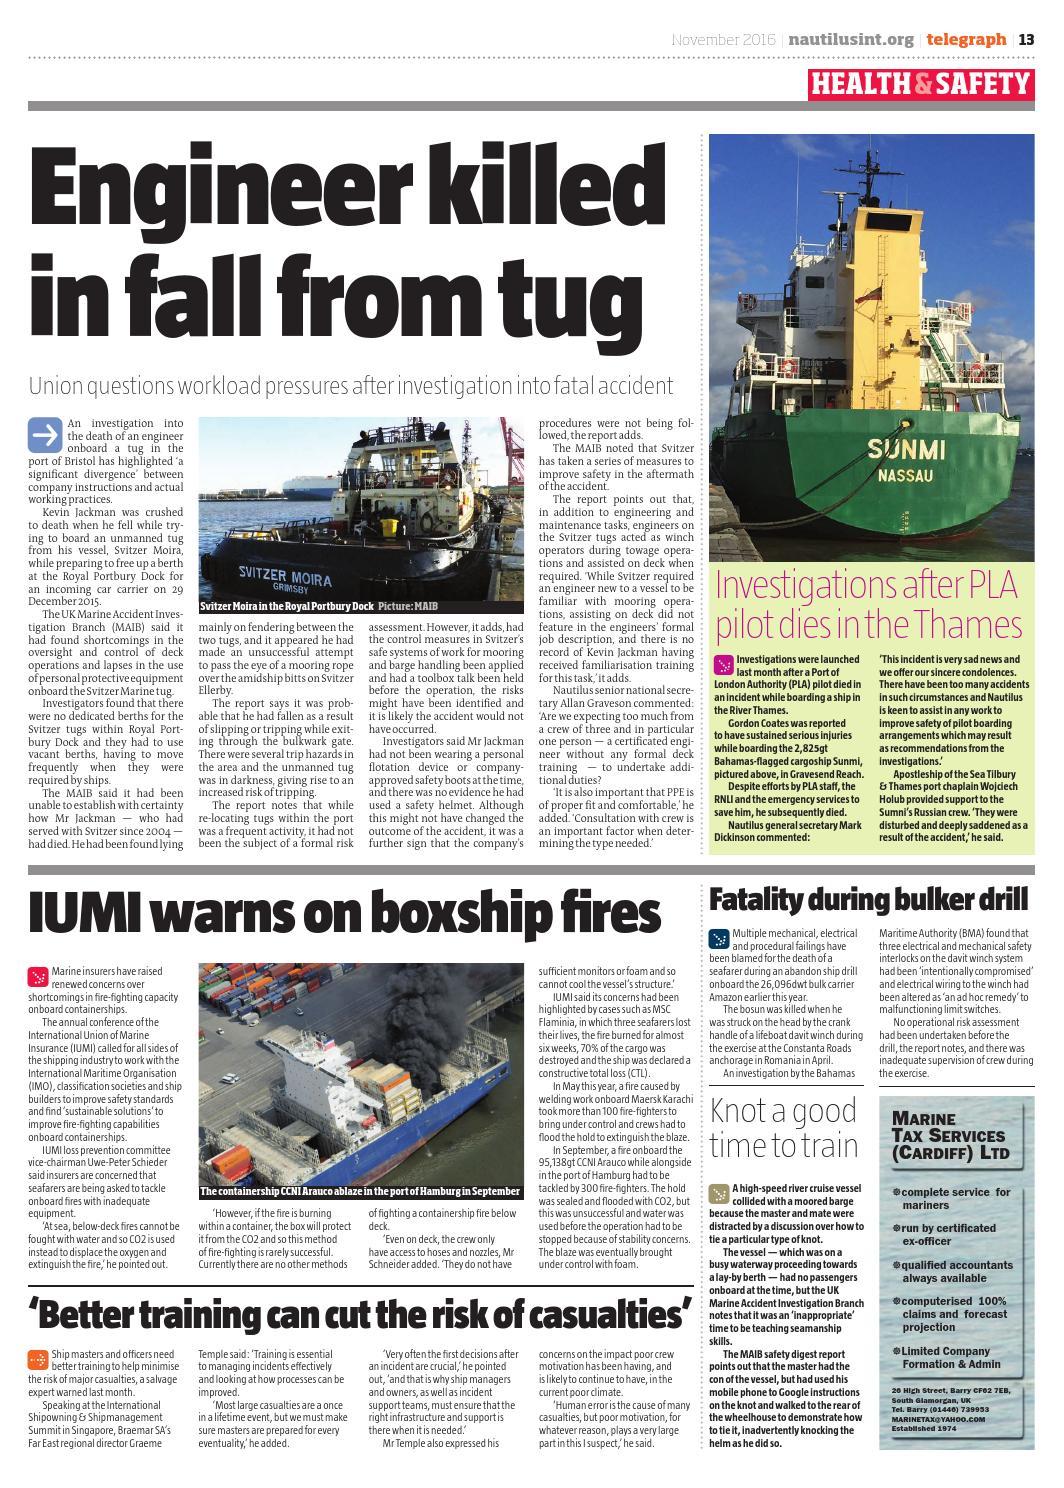 Nautilus Telegraph November 2016